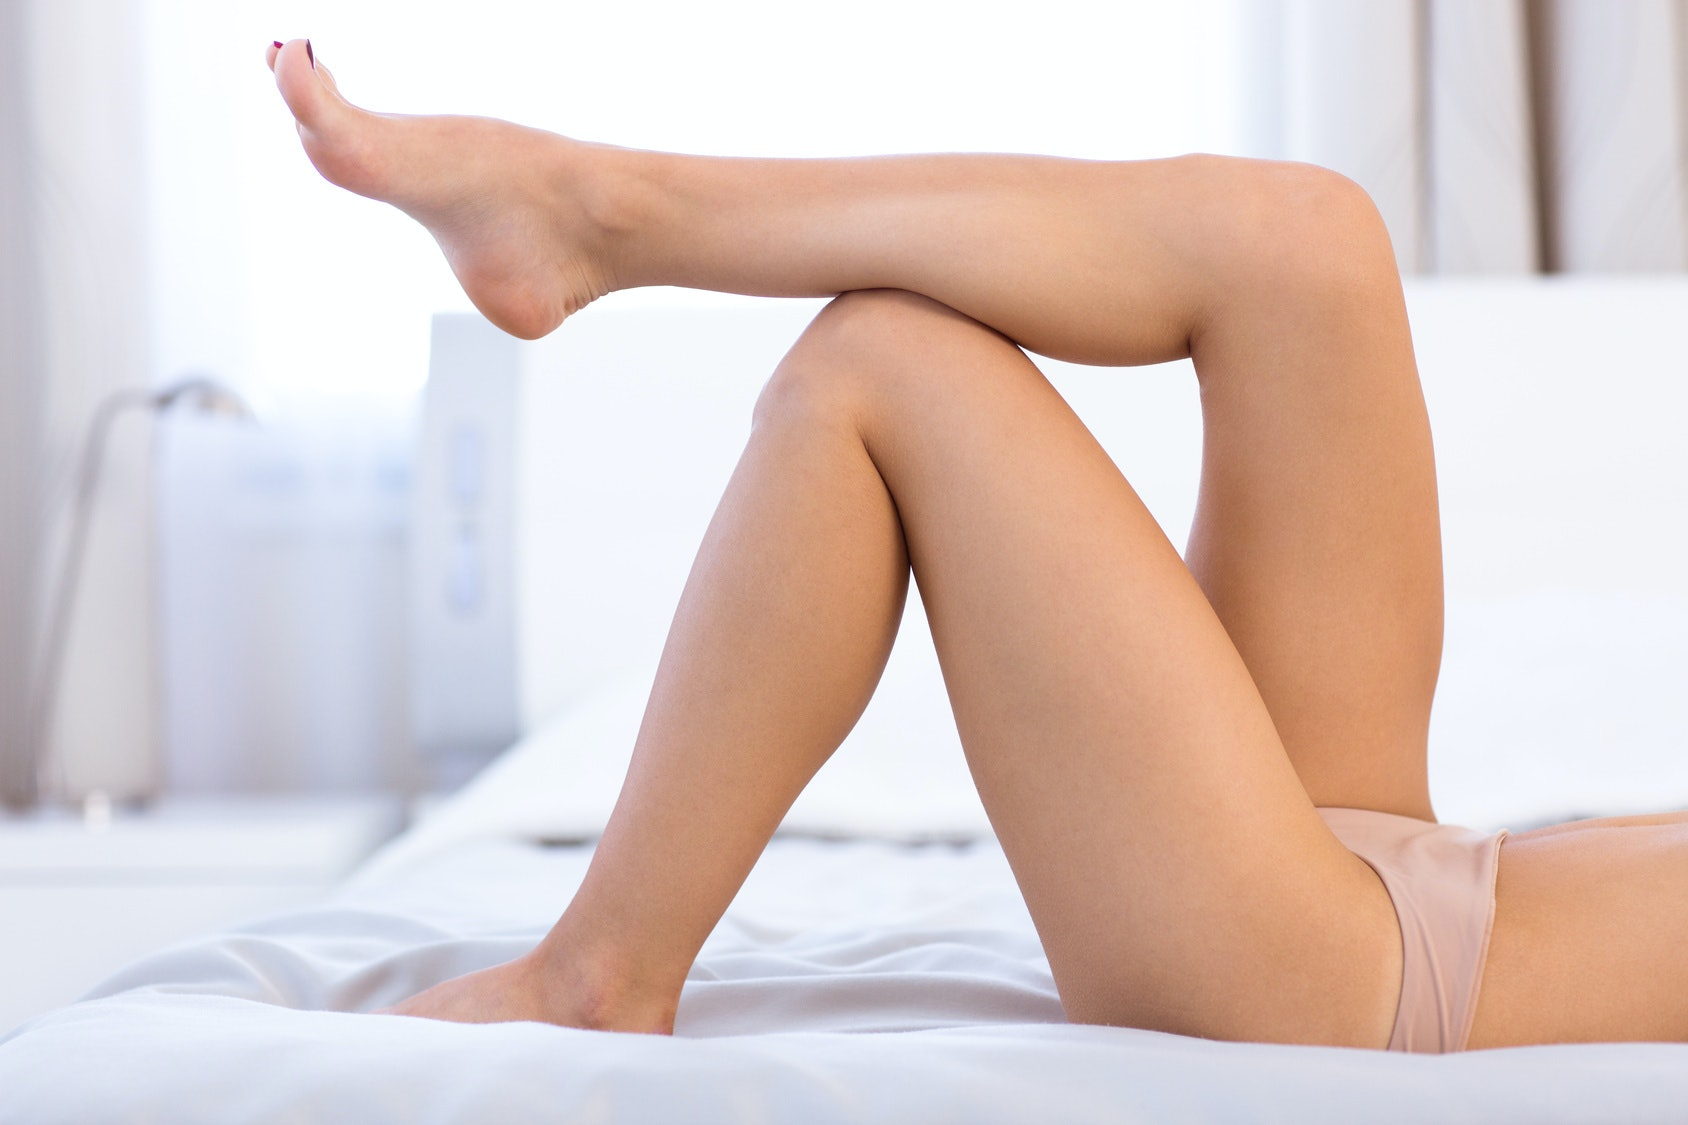 Girl Hand Down Panties